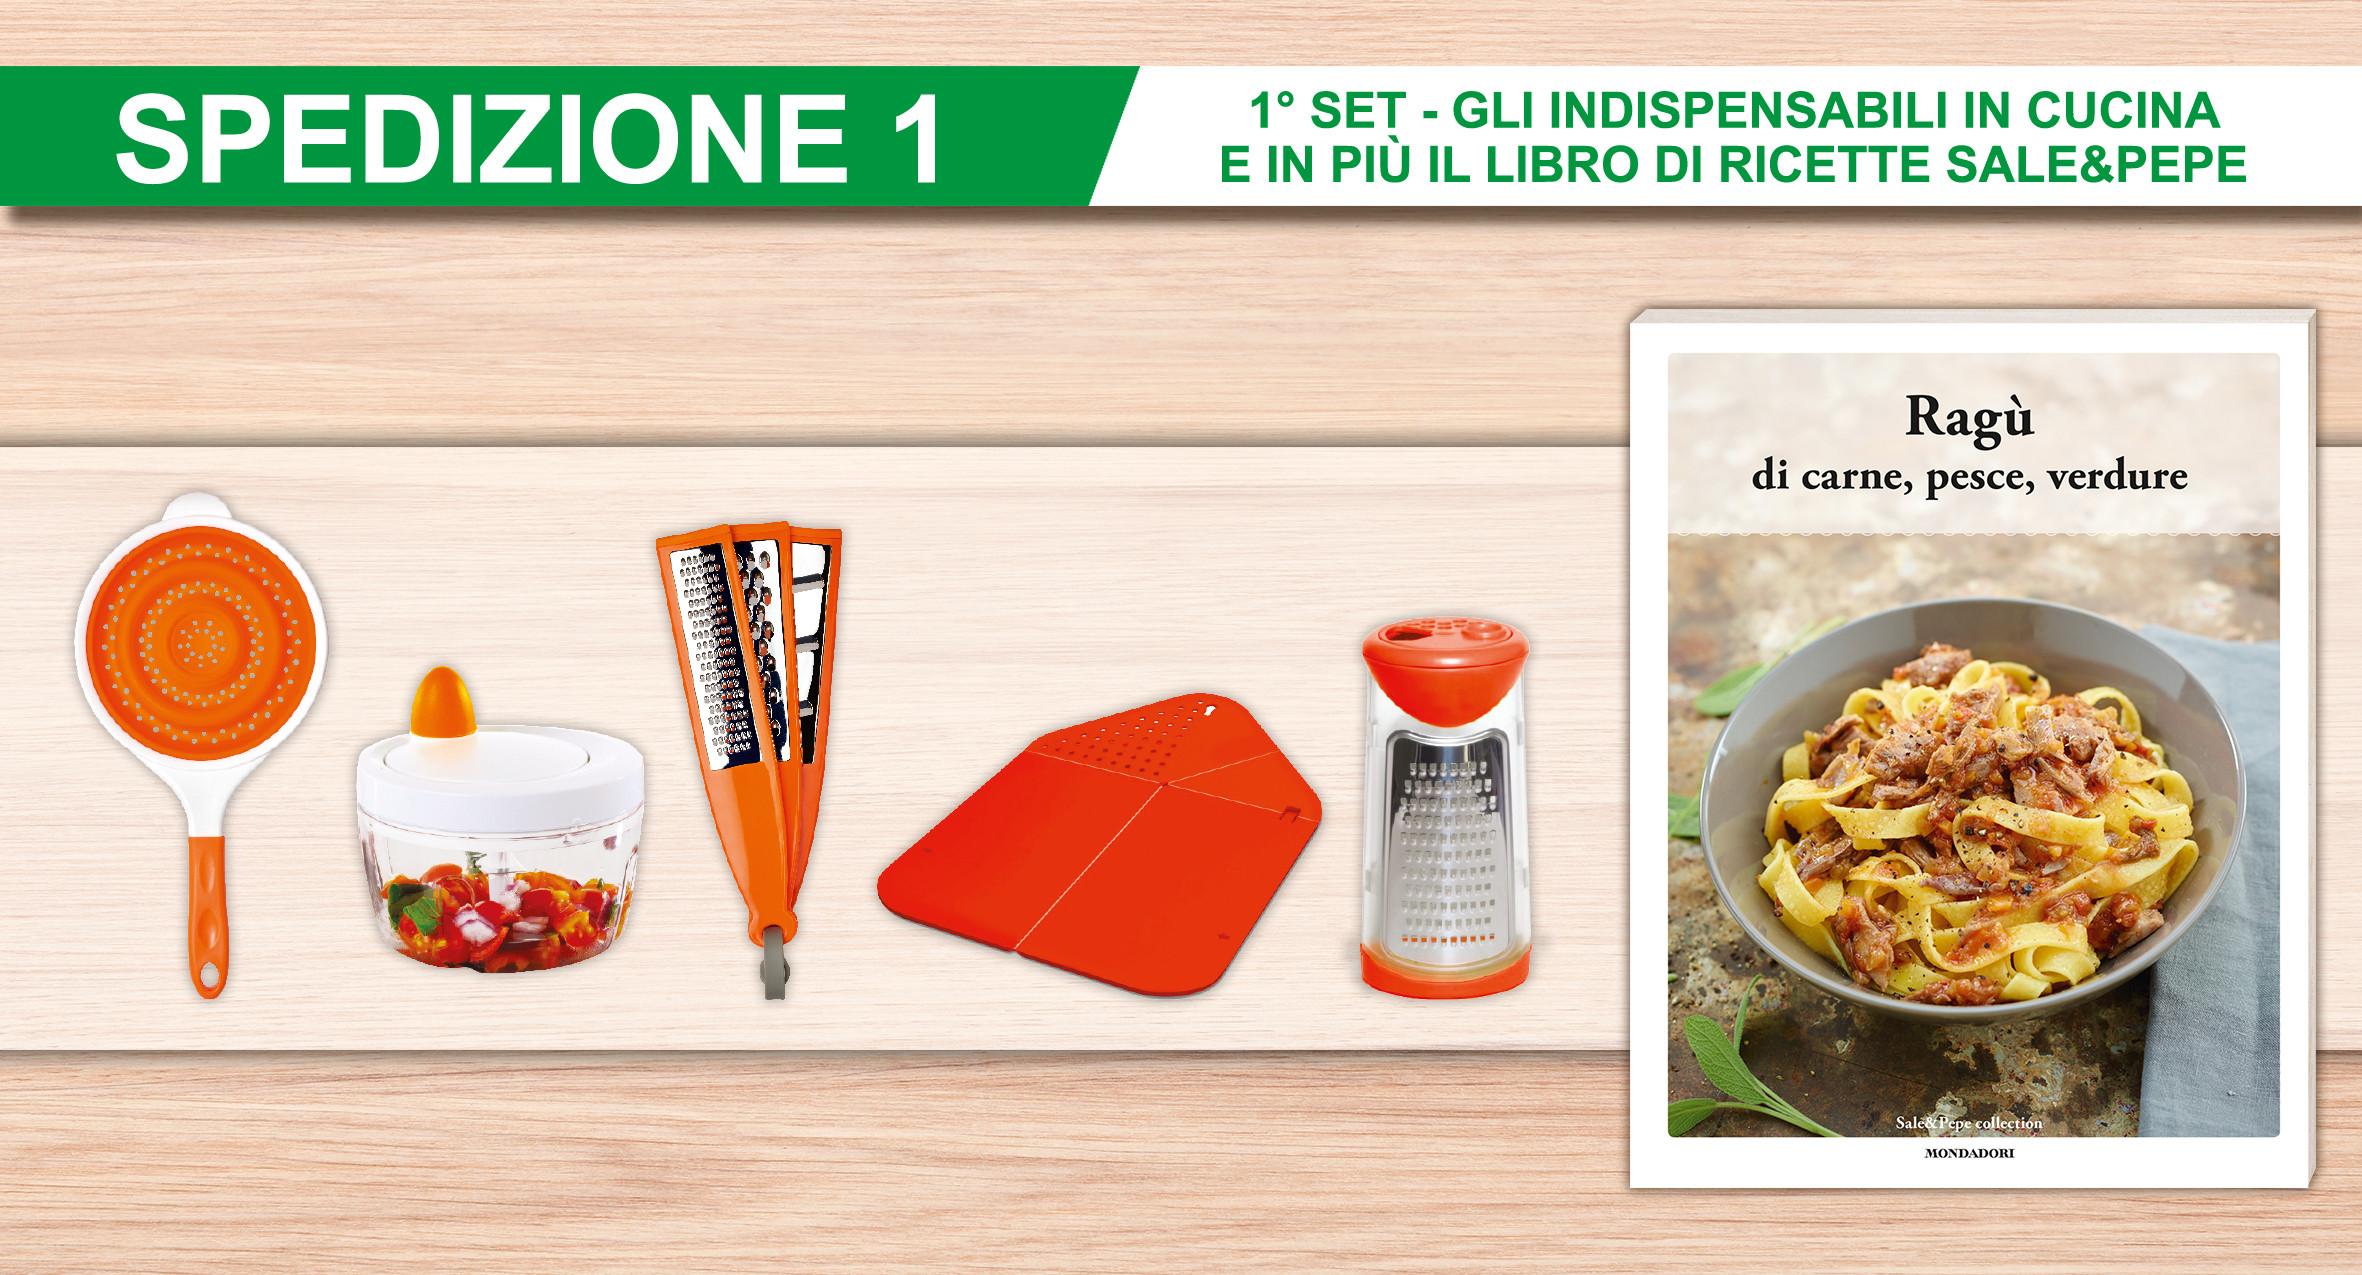 Gli indispensabili in cucina oggettistica in edicola - Utensili indispensabili in cucina ...